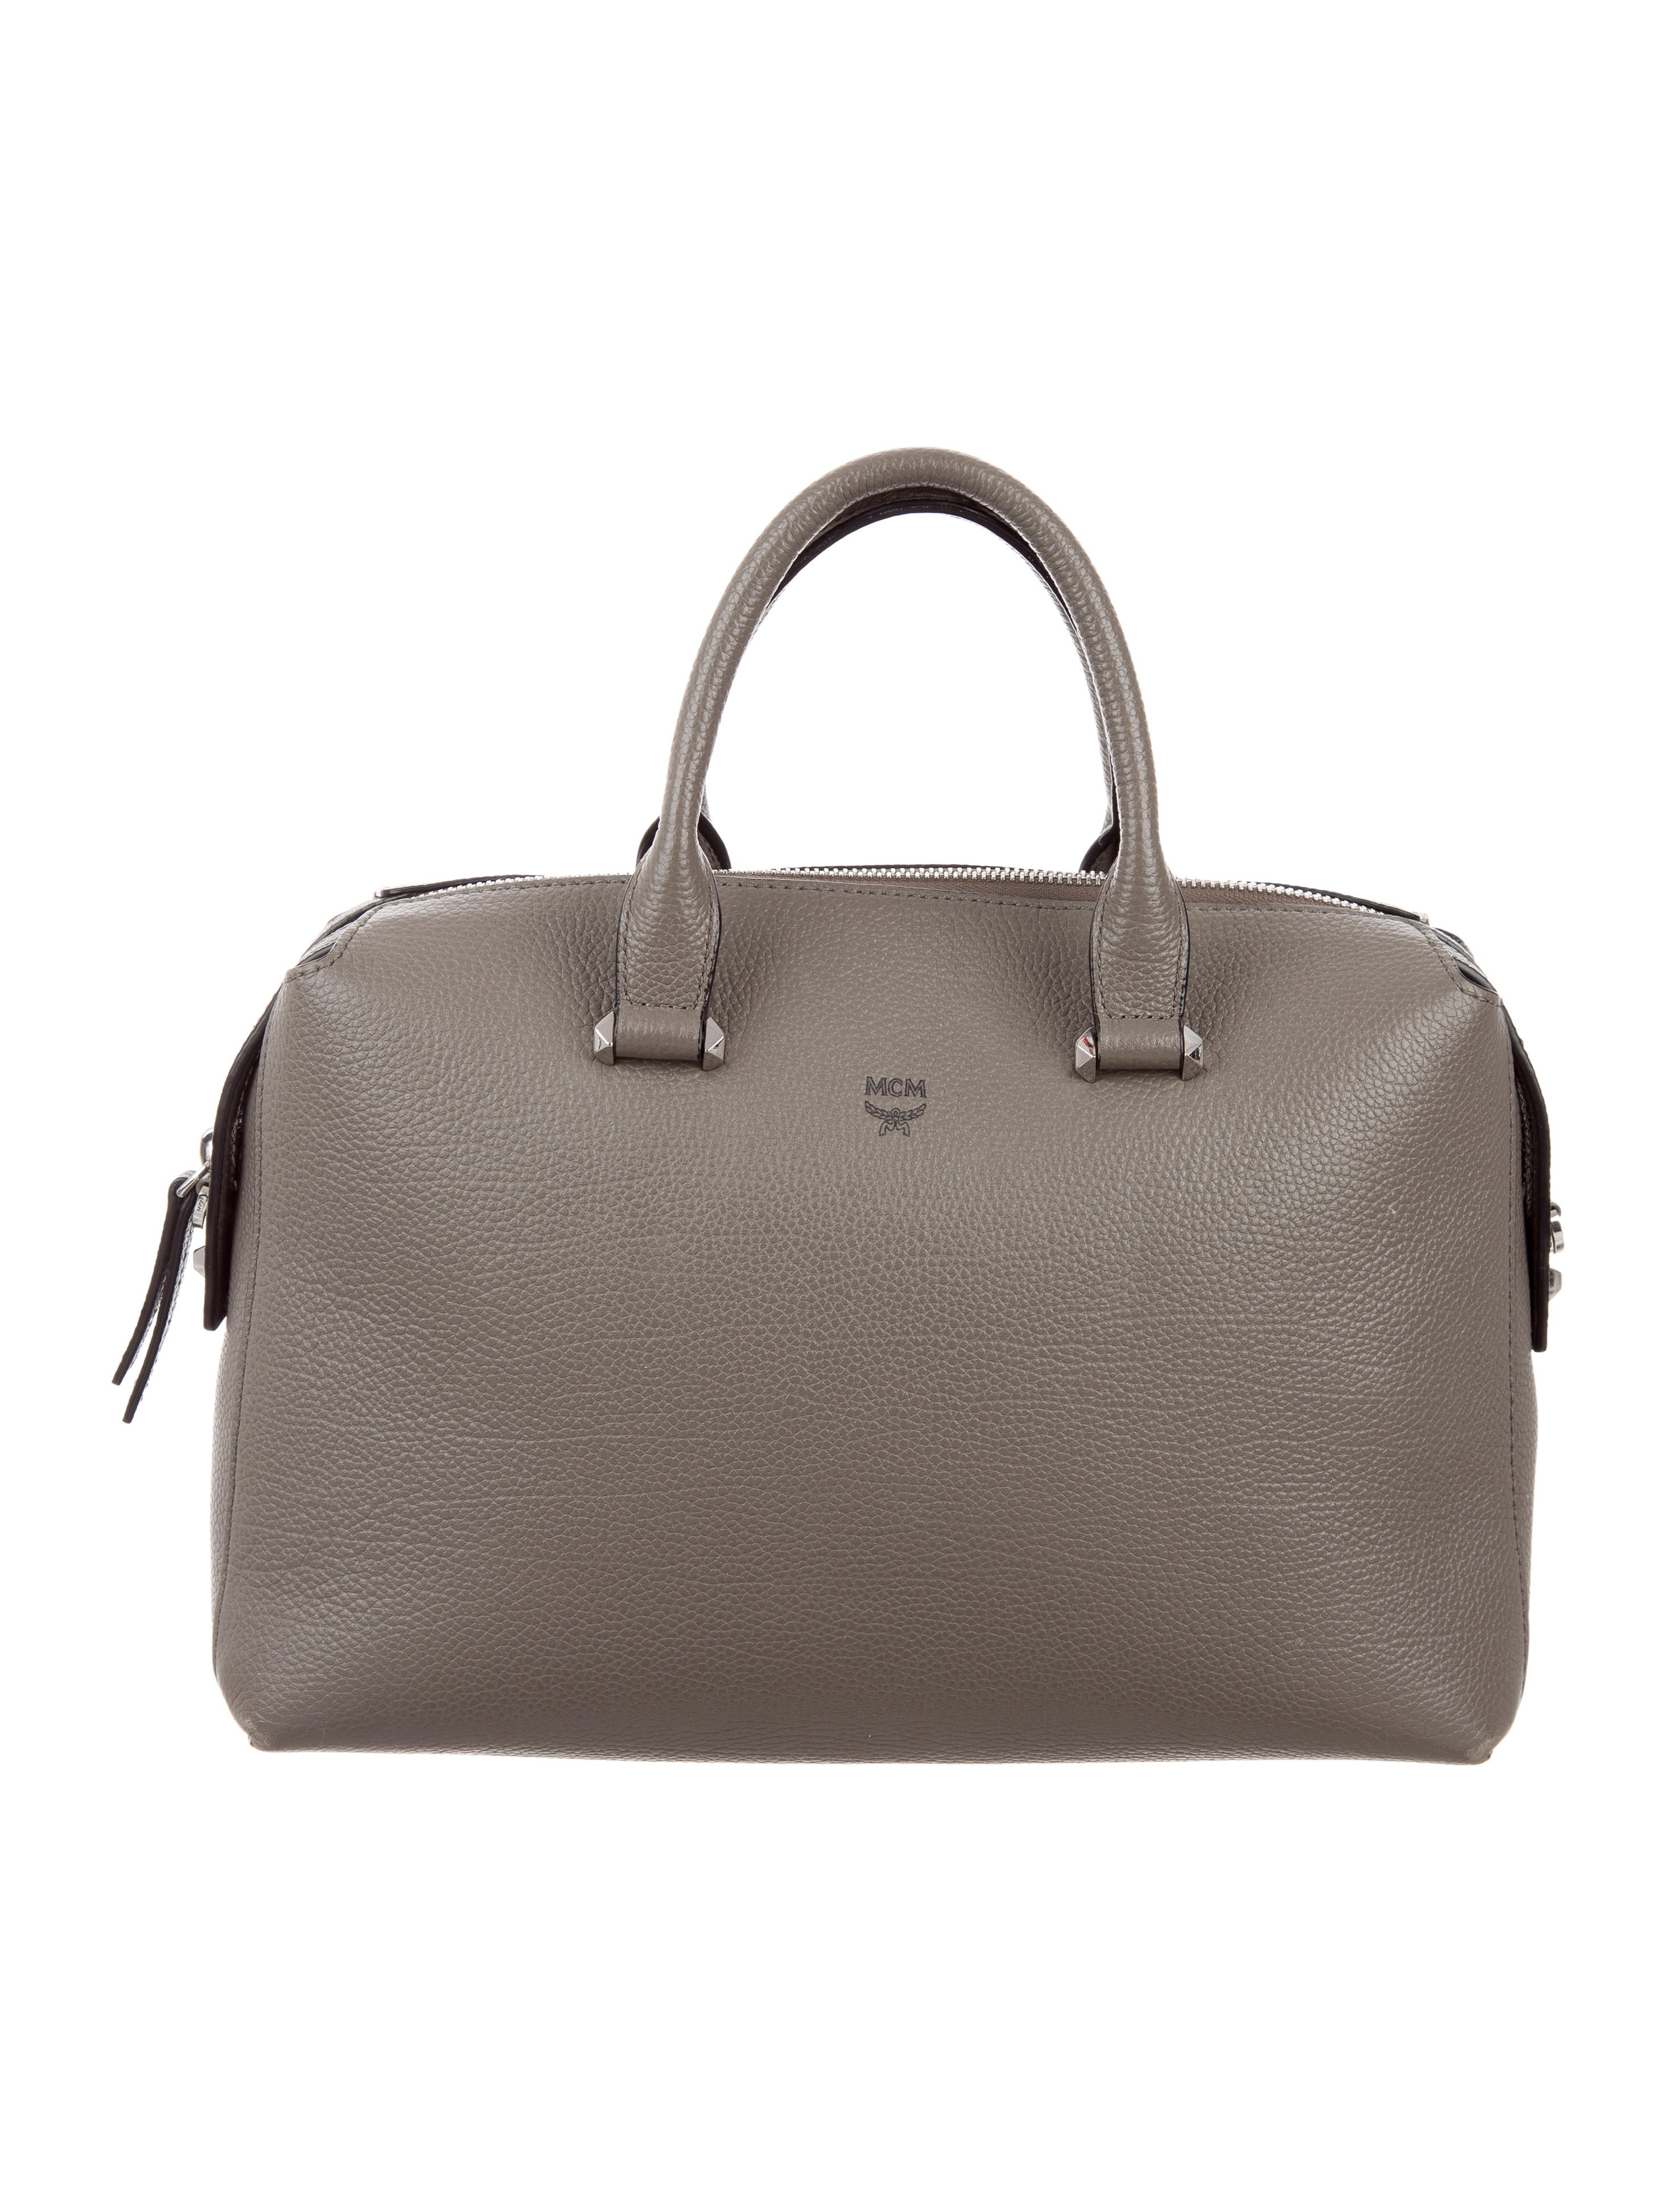 533853c8964ce5 MCM Medium Ella Boston Bag - Handbags - W3021779